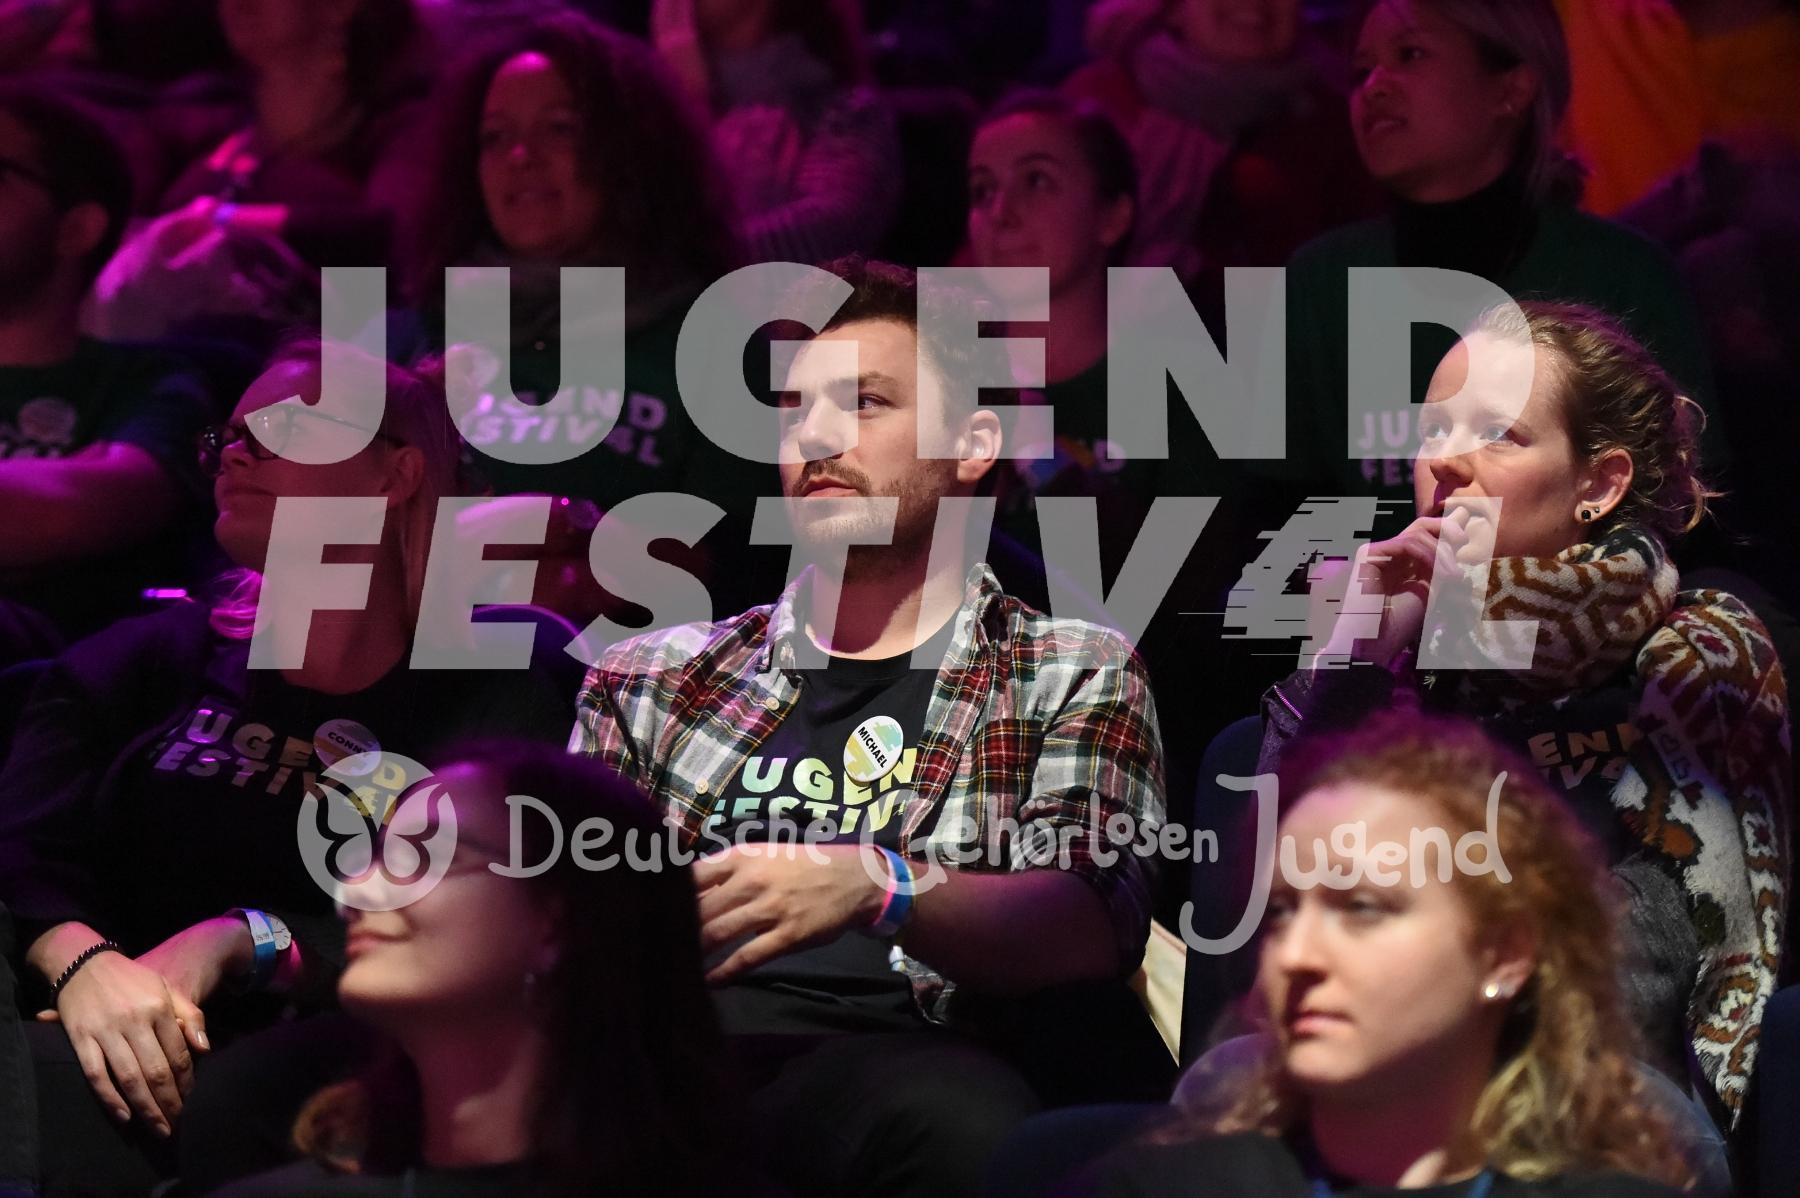 Jugendfestiv4l-229